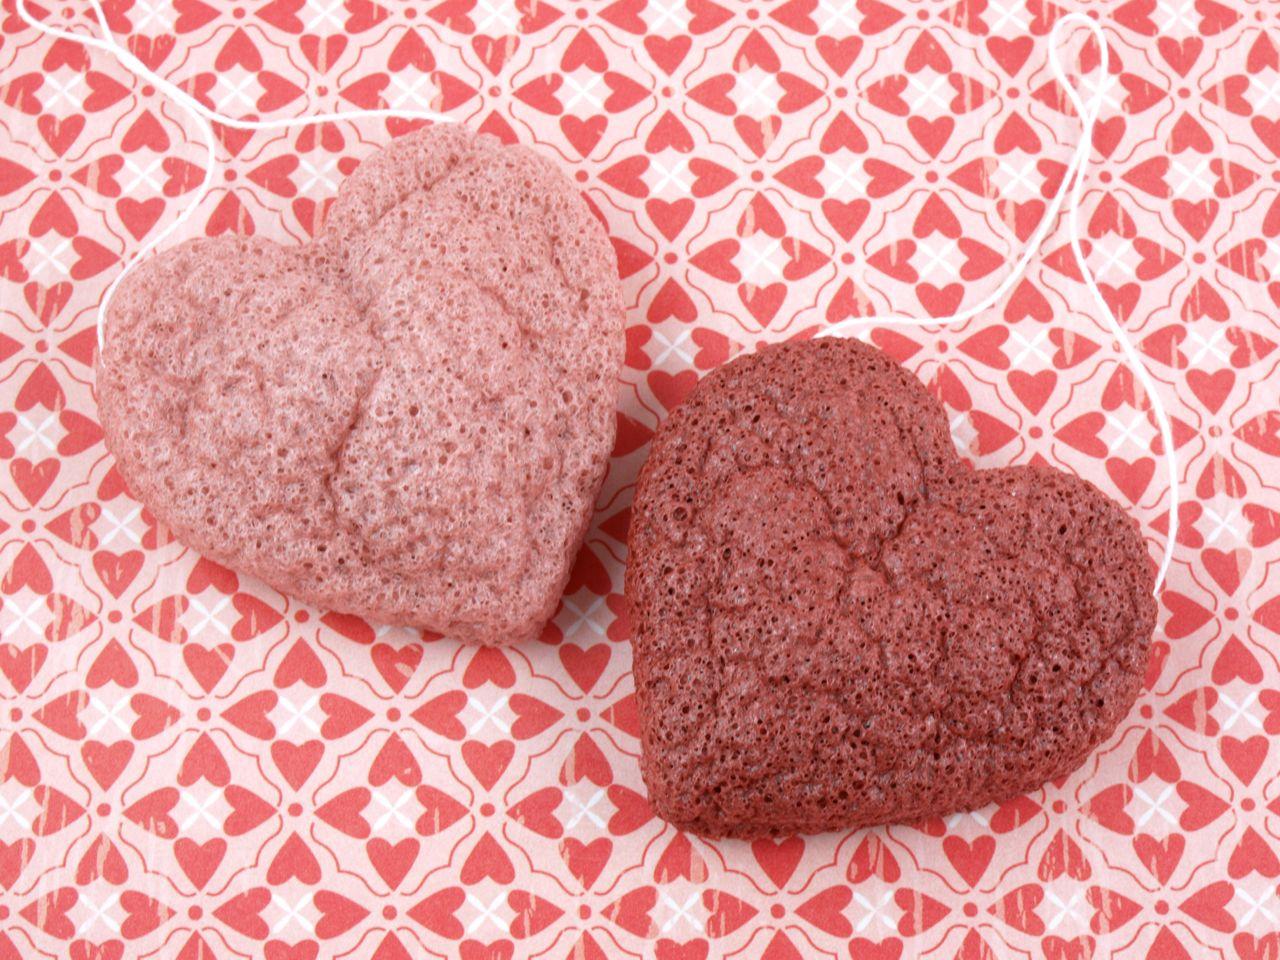 Sephora Clean Machine Konjac Sponge Duo Love Me Pink And Red Clay